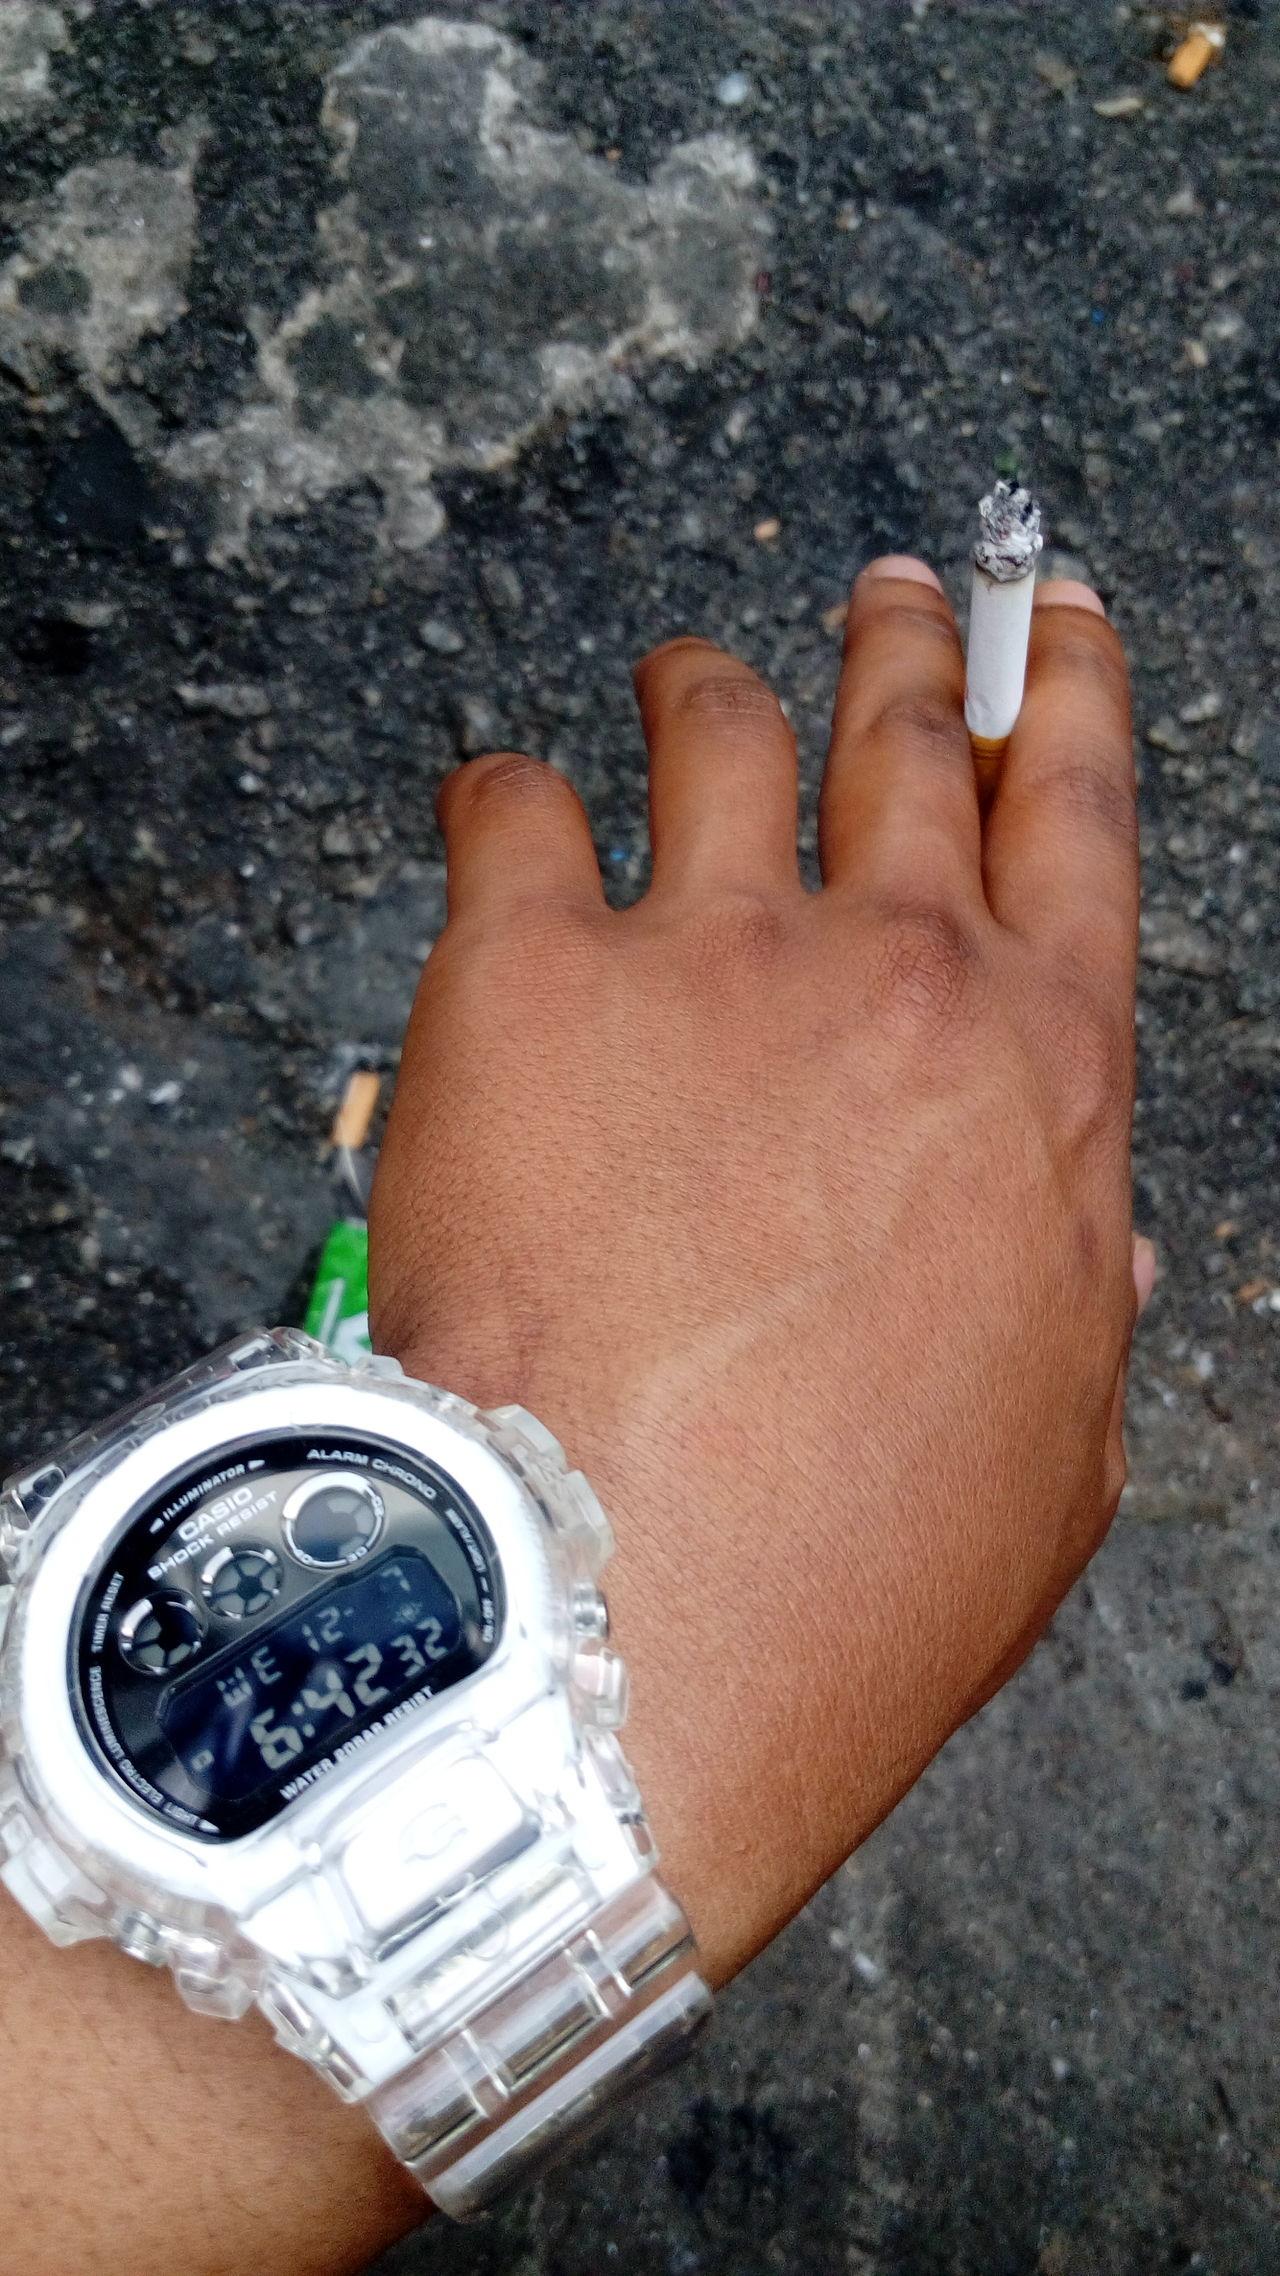 smoking kills..kills stress.. Ciggar Ciggarette For A Thousand Problems Gshock_Lover Casio G-shock Dw6900nb7 Eminem Icejelly